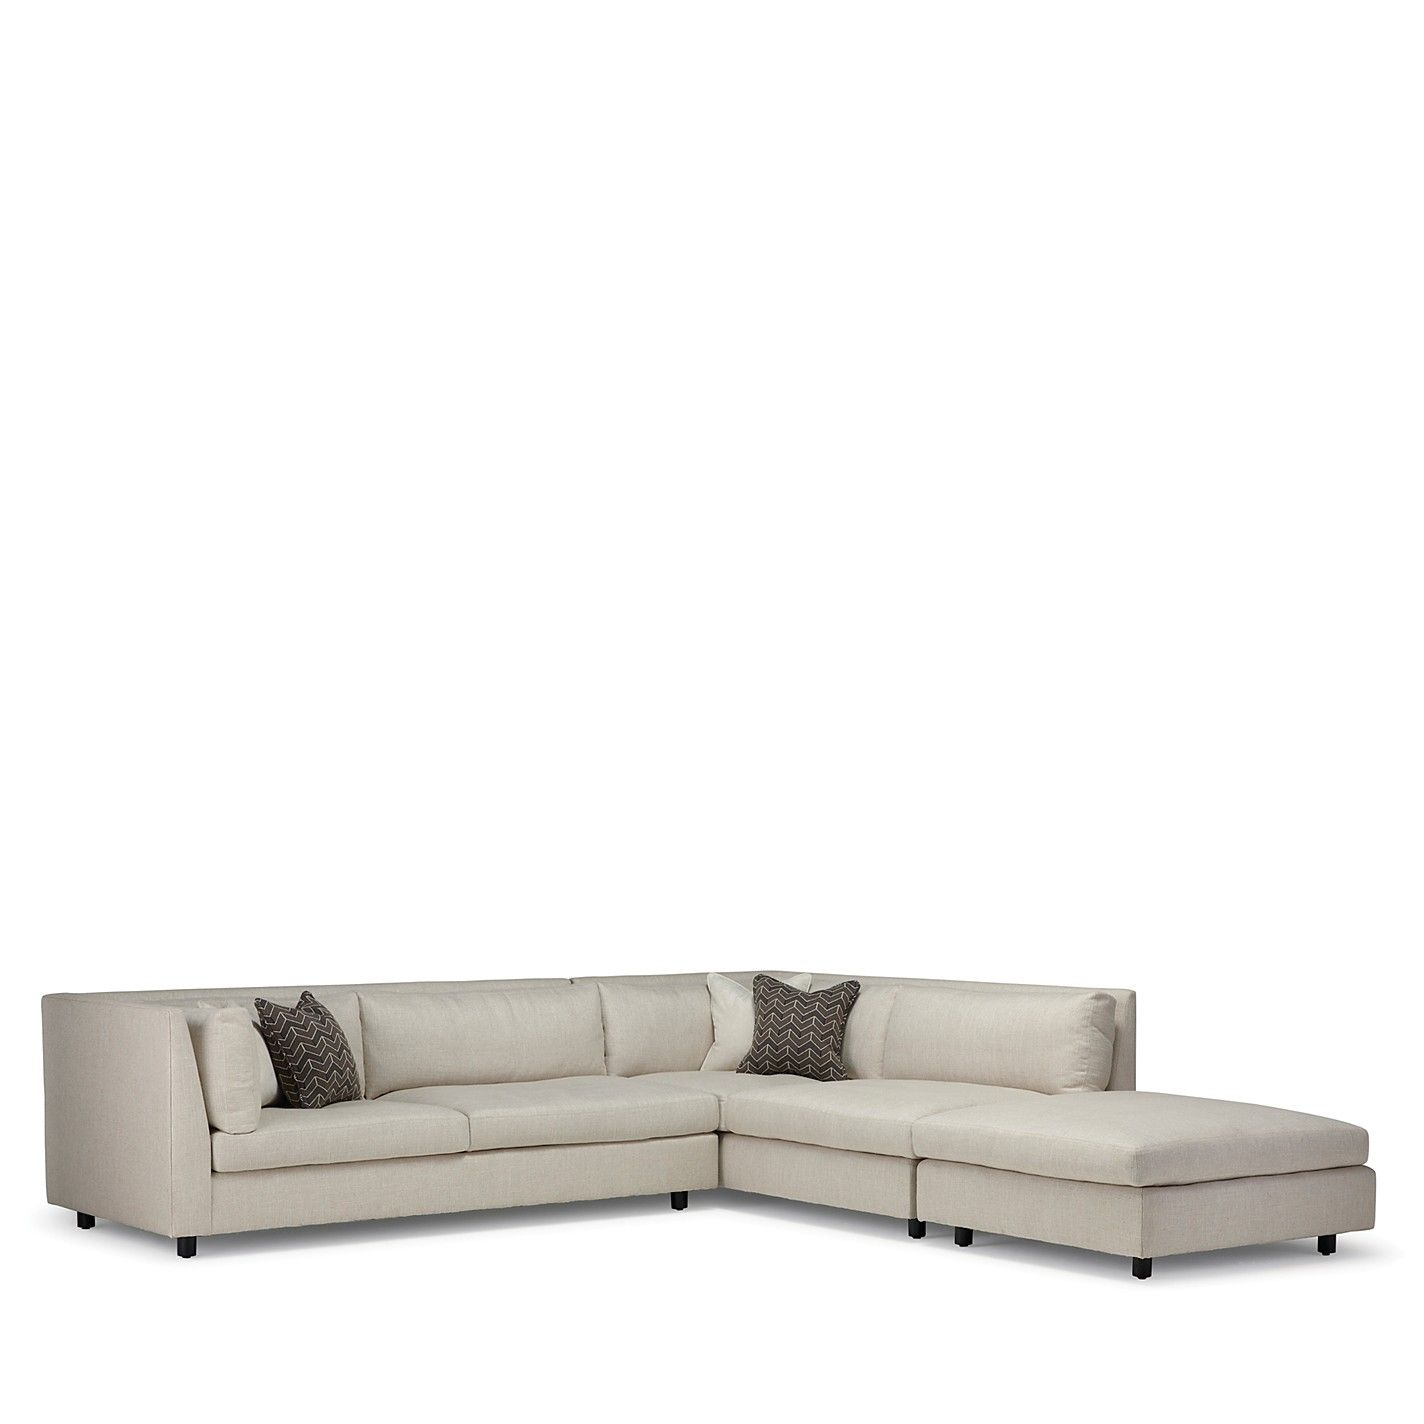 Mitc Gold Bob Williams Franco Sofa Sectional Bloomingdale S